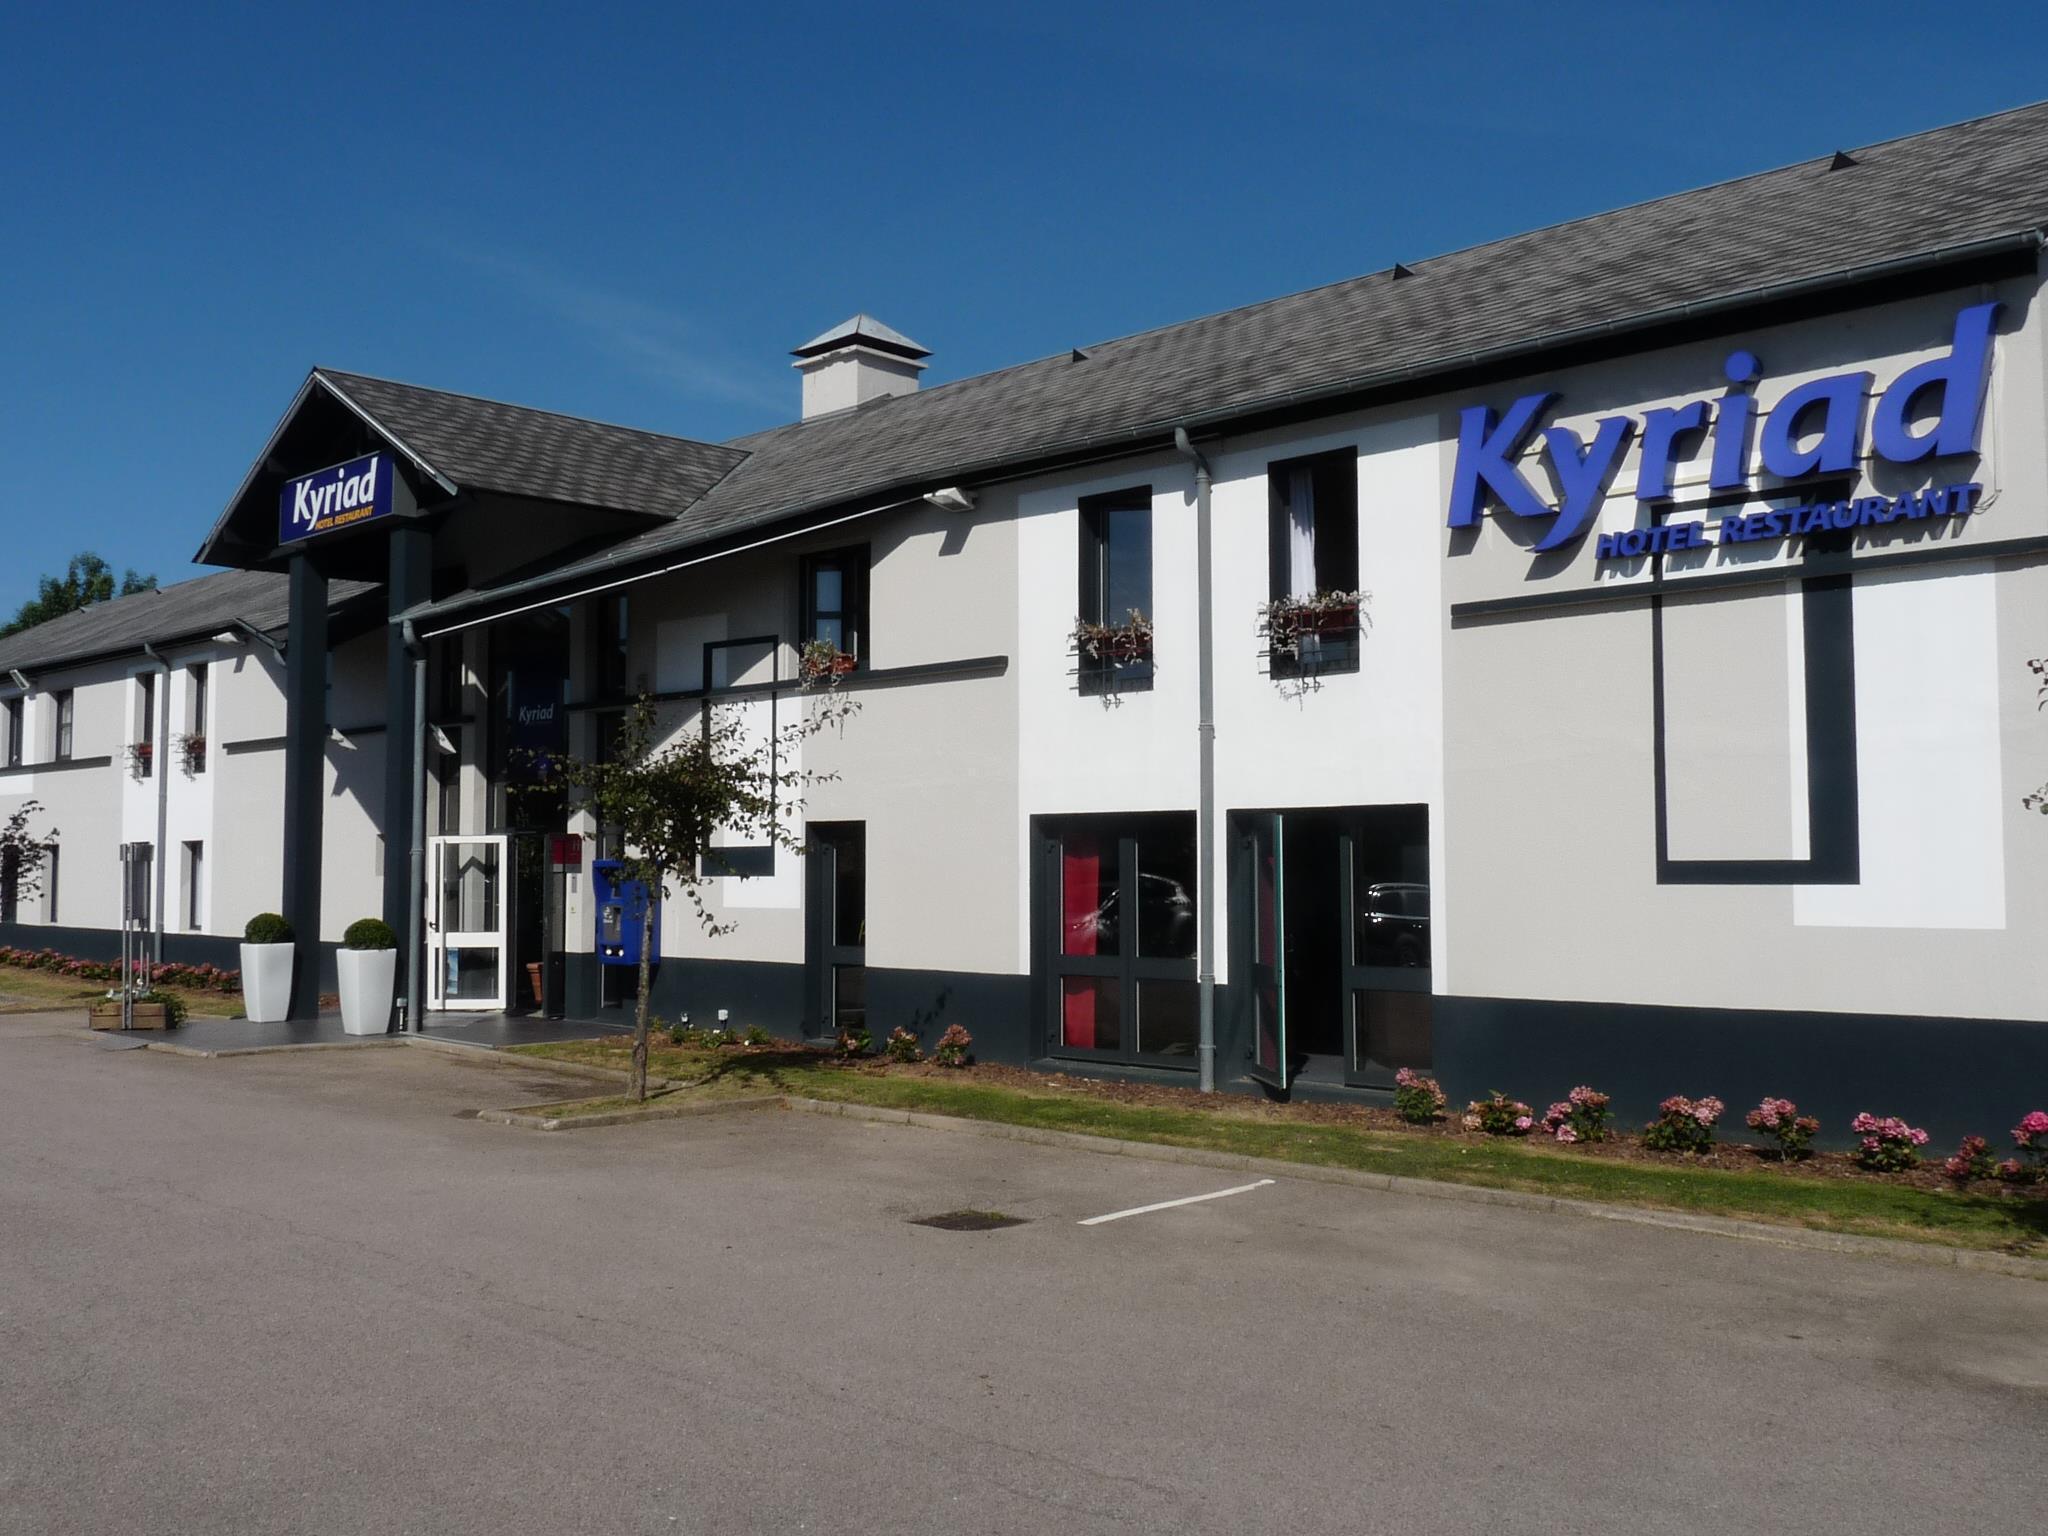 Kyriad Dieppe Hotel